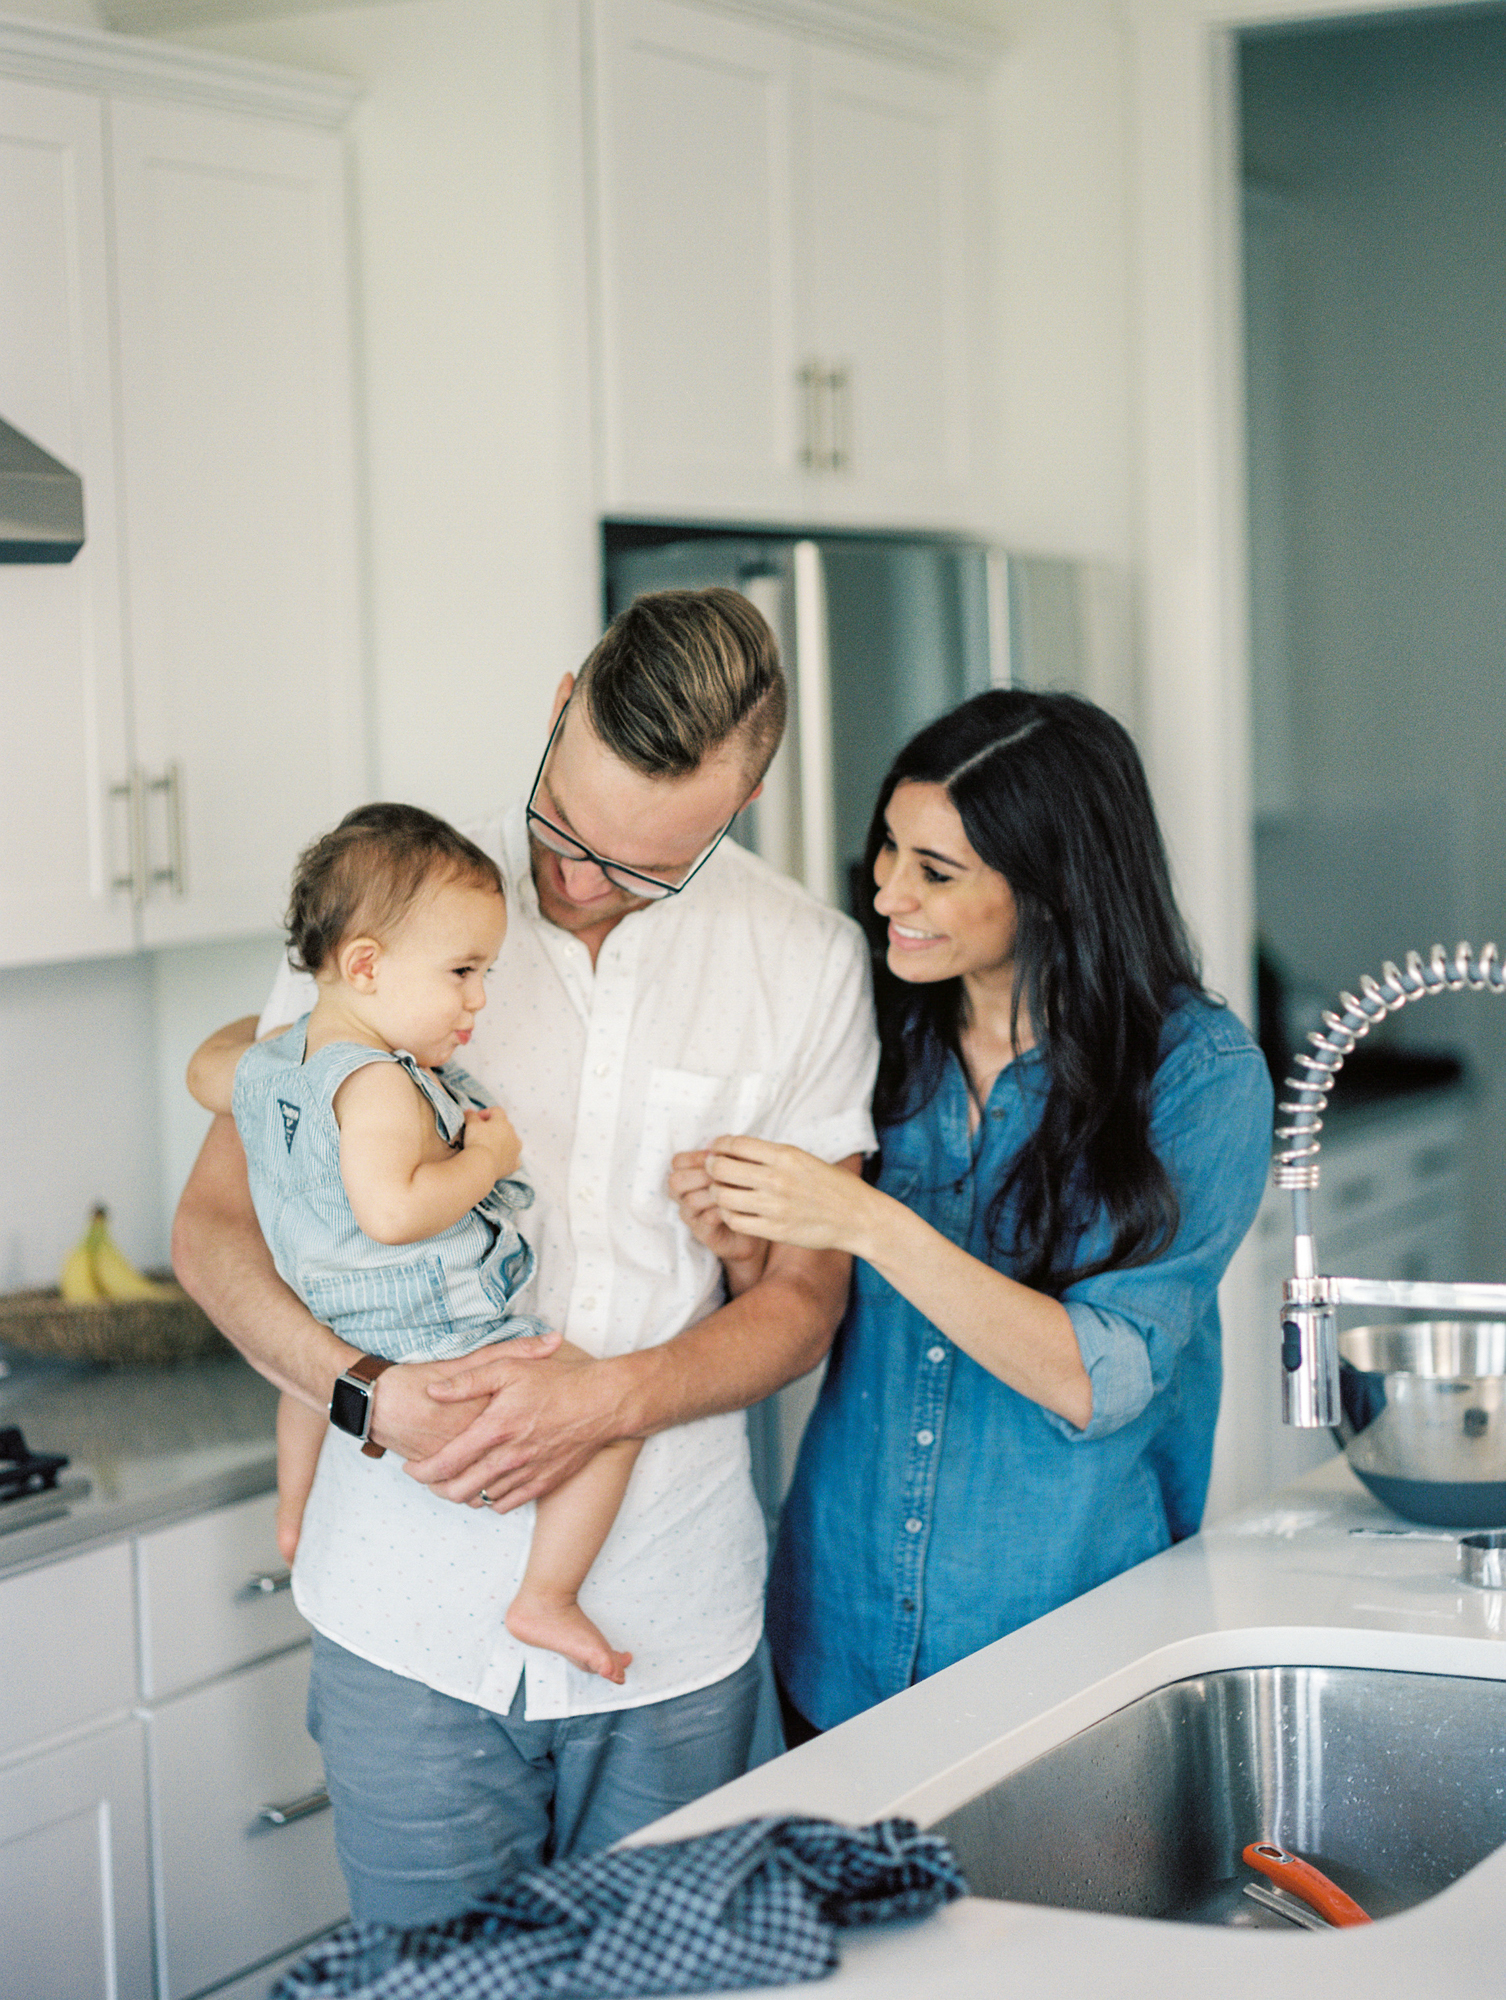 Lynchburg_DC_family_wedding_film_photographer_white_kitchen_baby_announcement-28.jpg